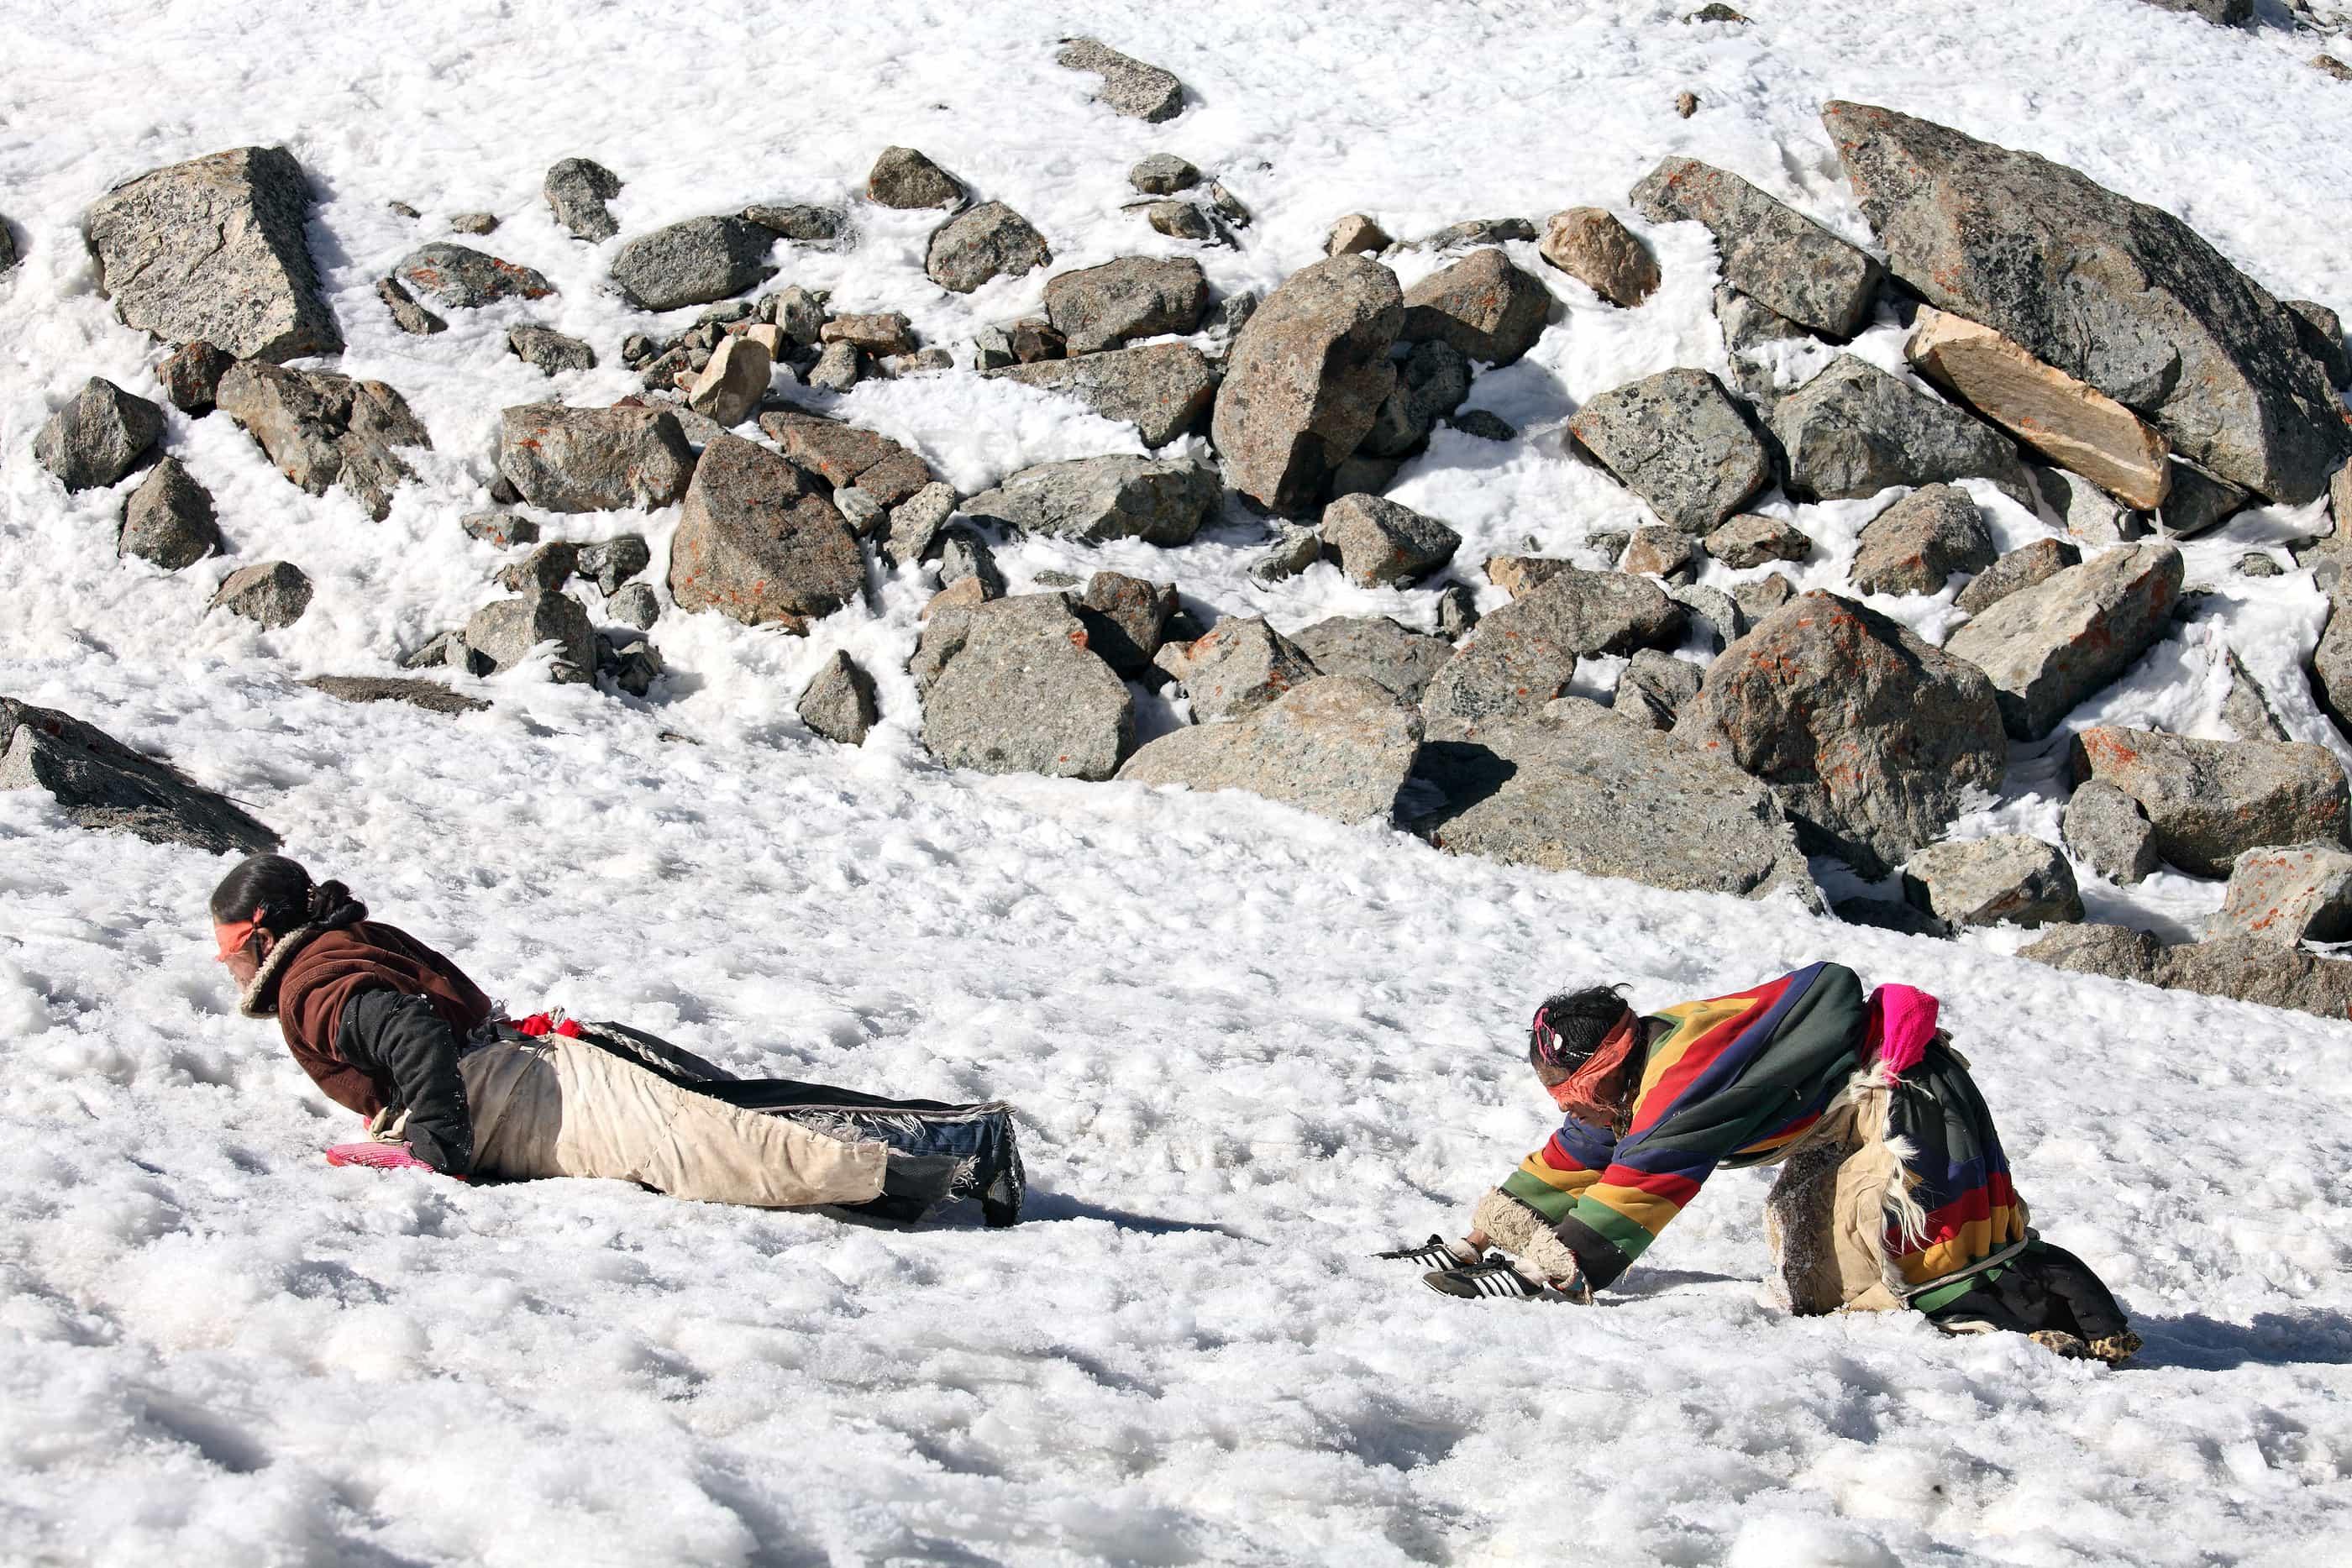 Mt Kailash, Tibet, China - May 26, 2012: Buddhist woman pilgrims